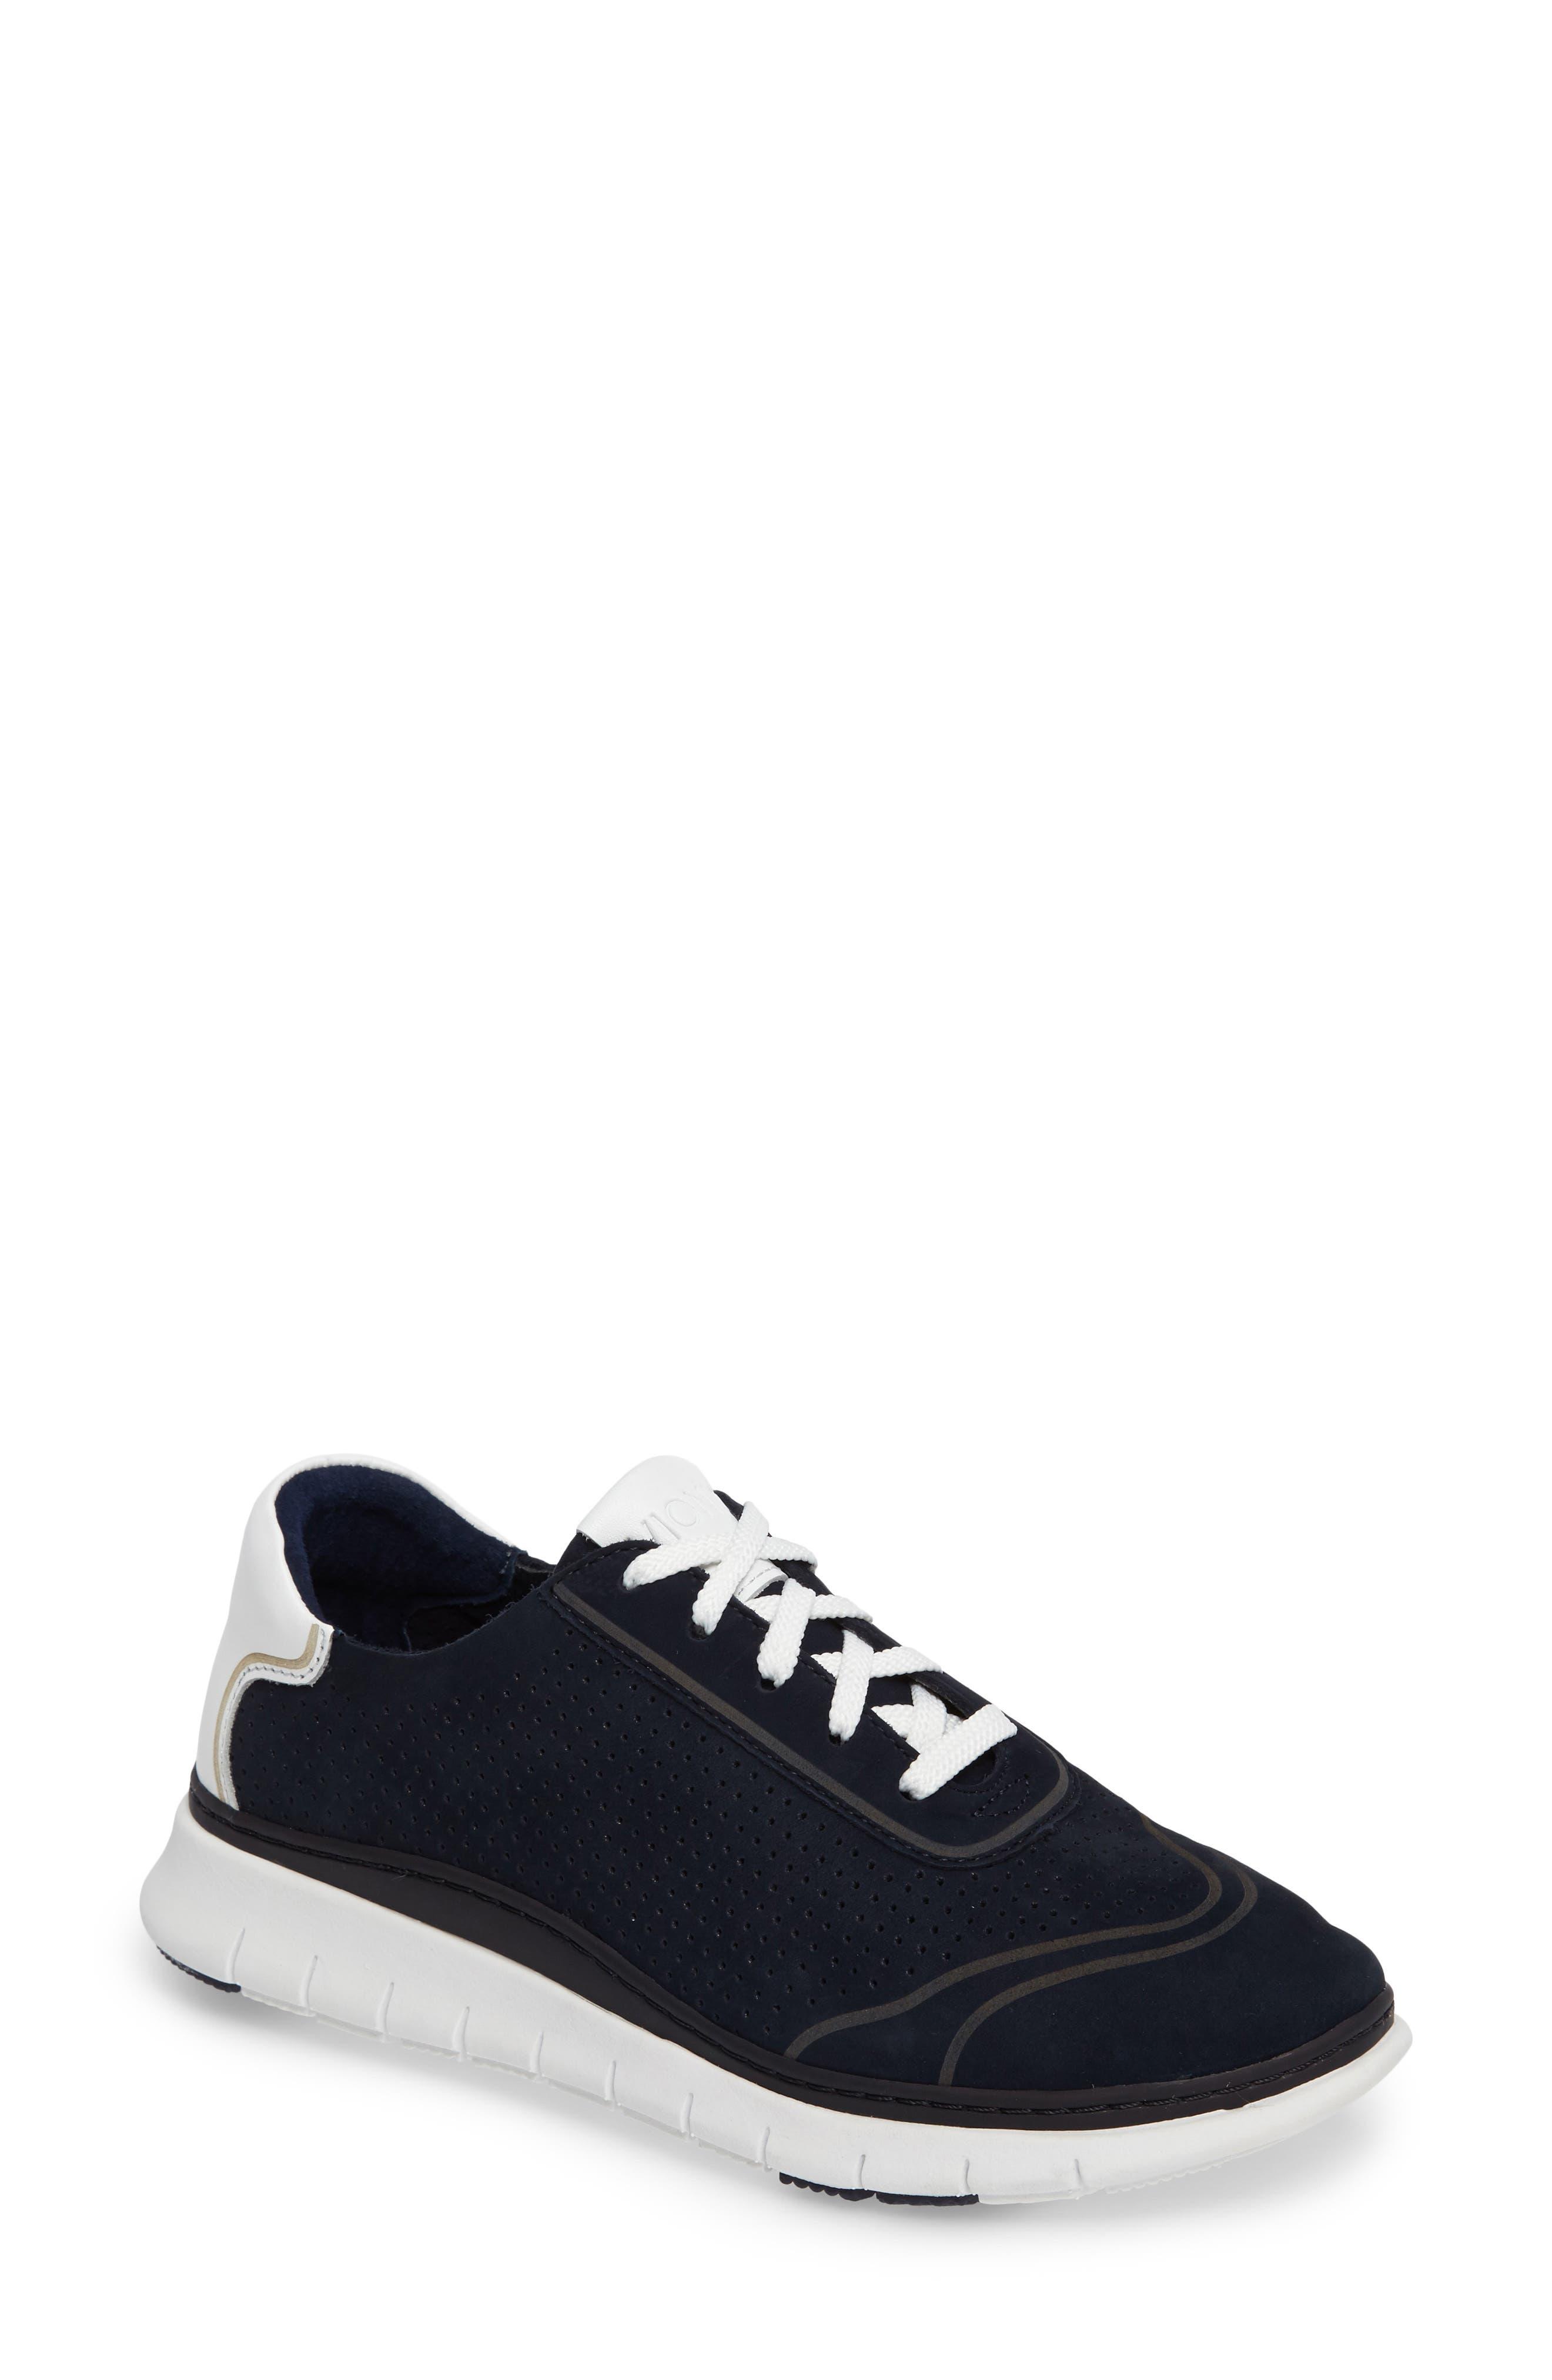 Alternate Image 1 Selected - Vionic Fresh Riley Perforated Sneaker (Women)